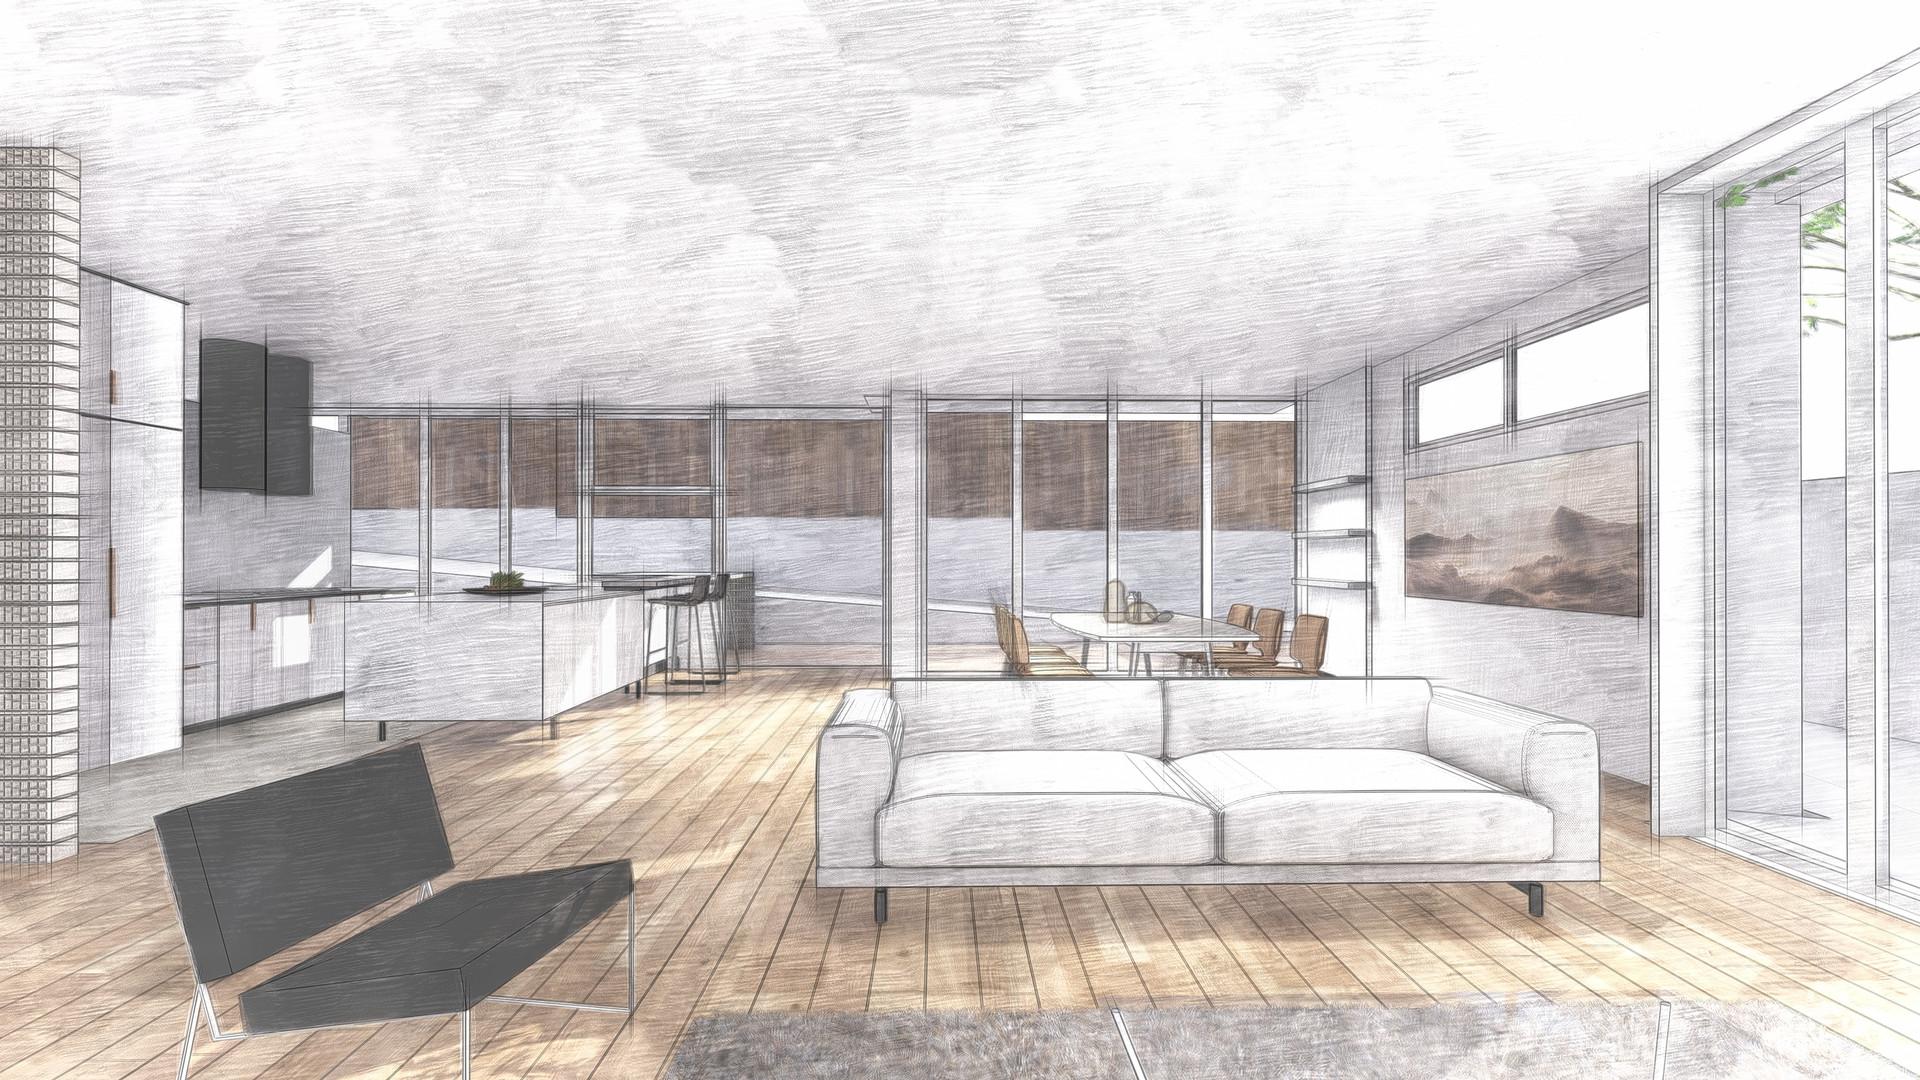 Hospitality Architecture